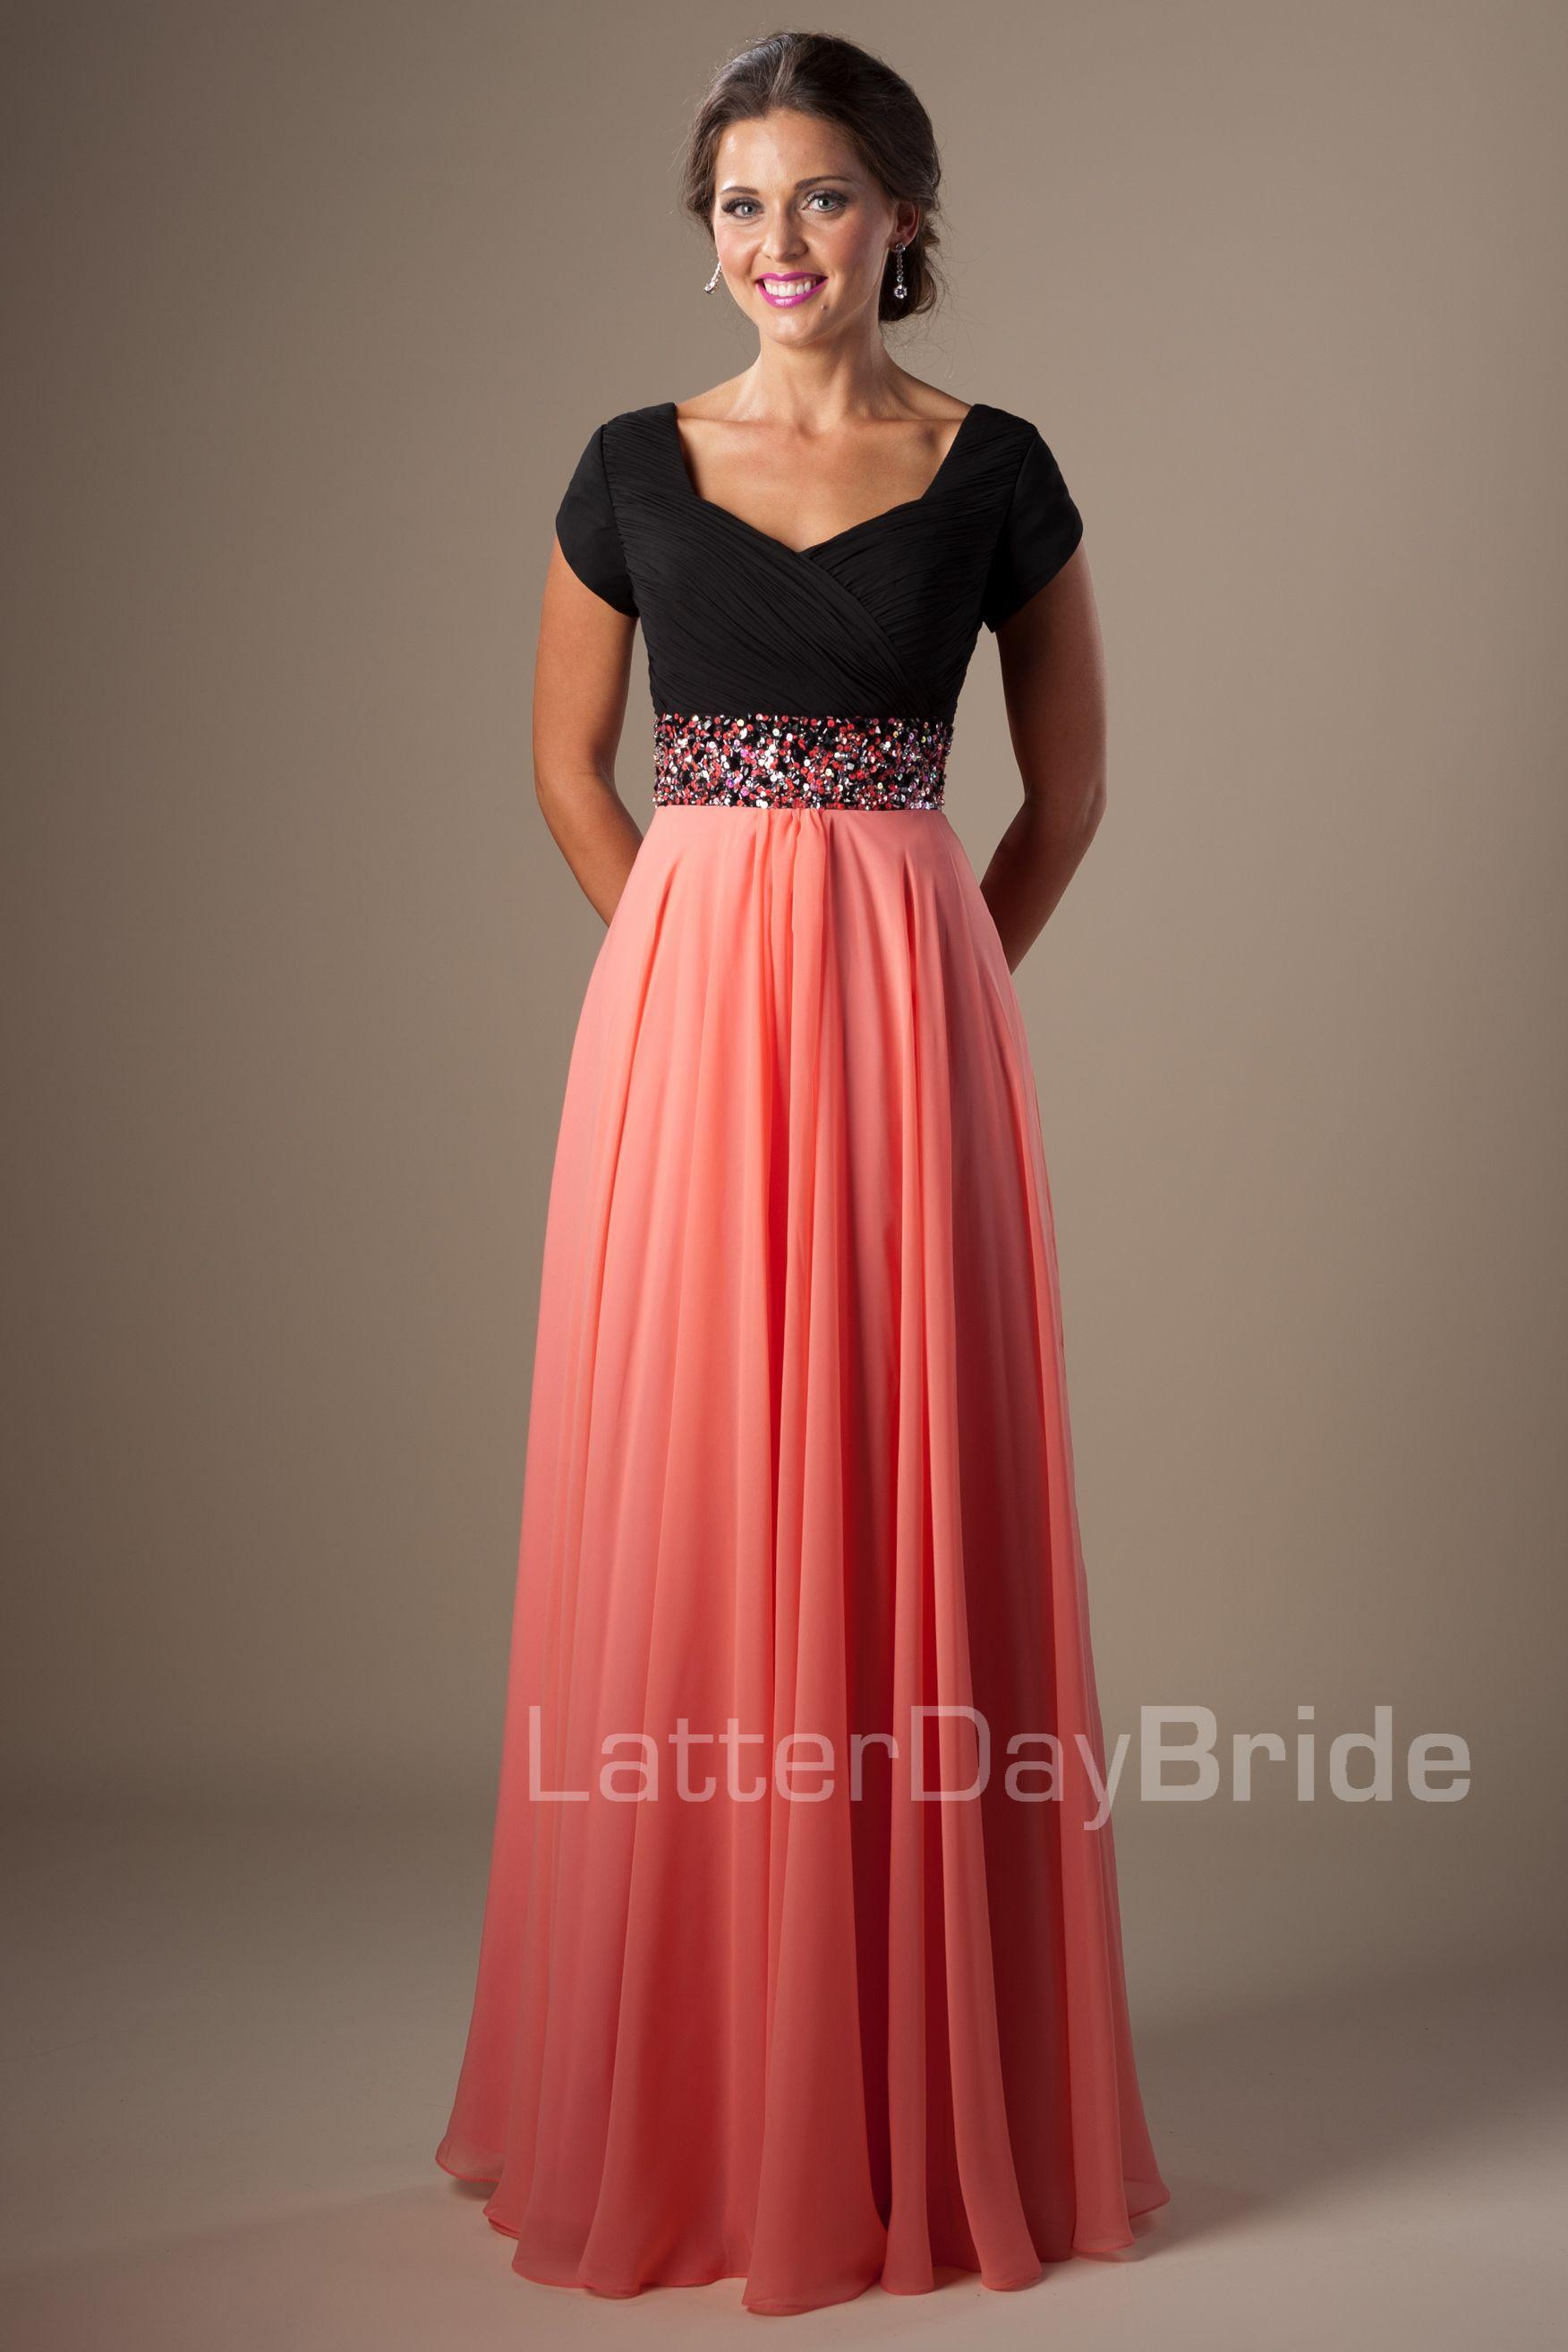 Modest prom dresses lucy dresses pinterest vestidos